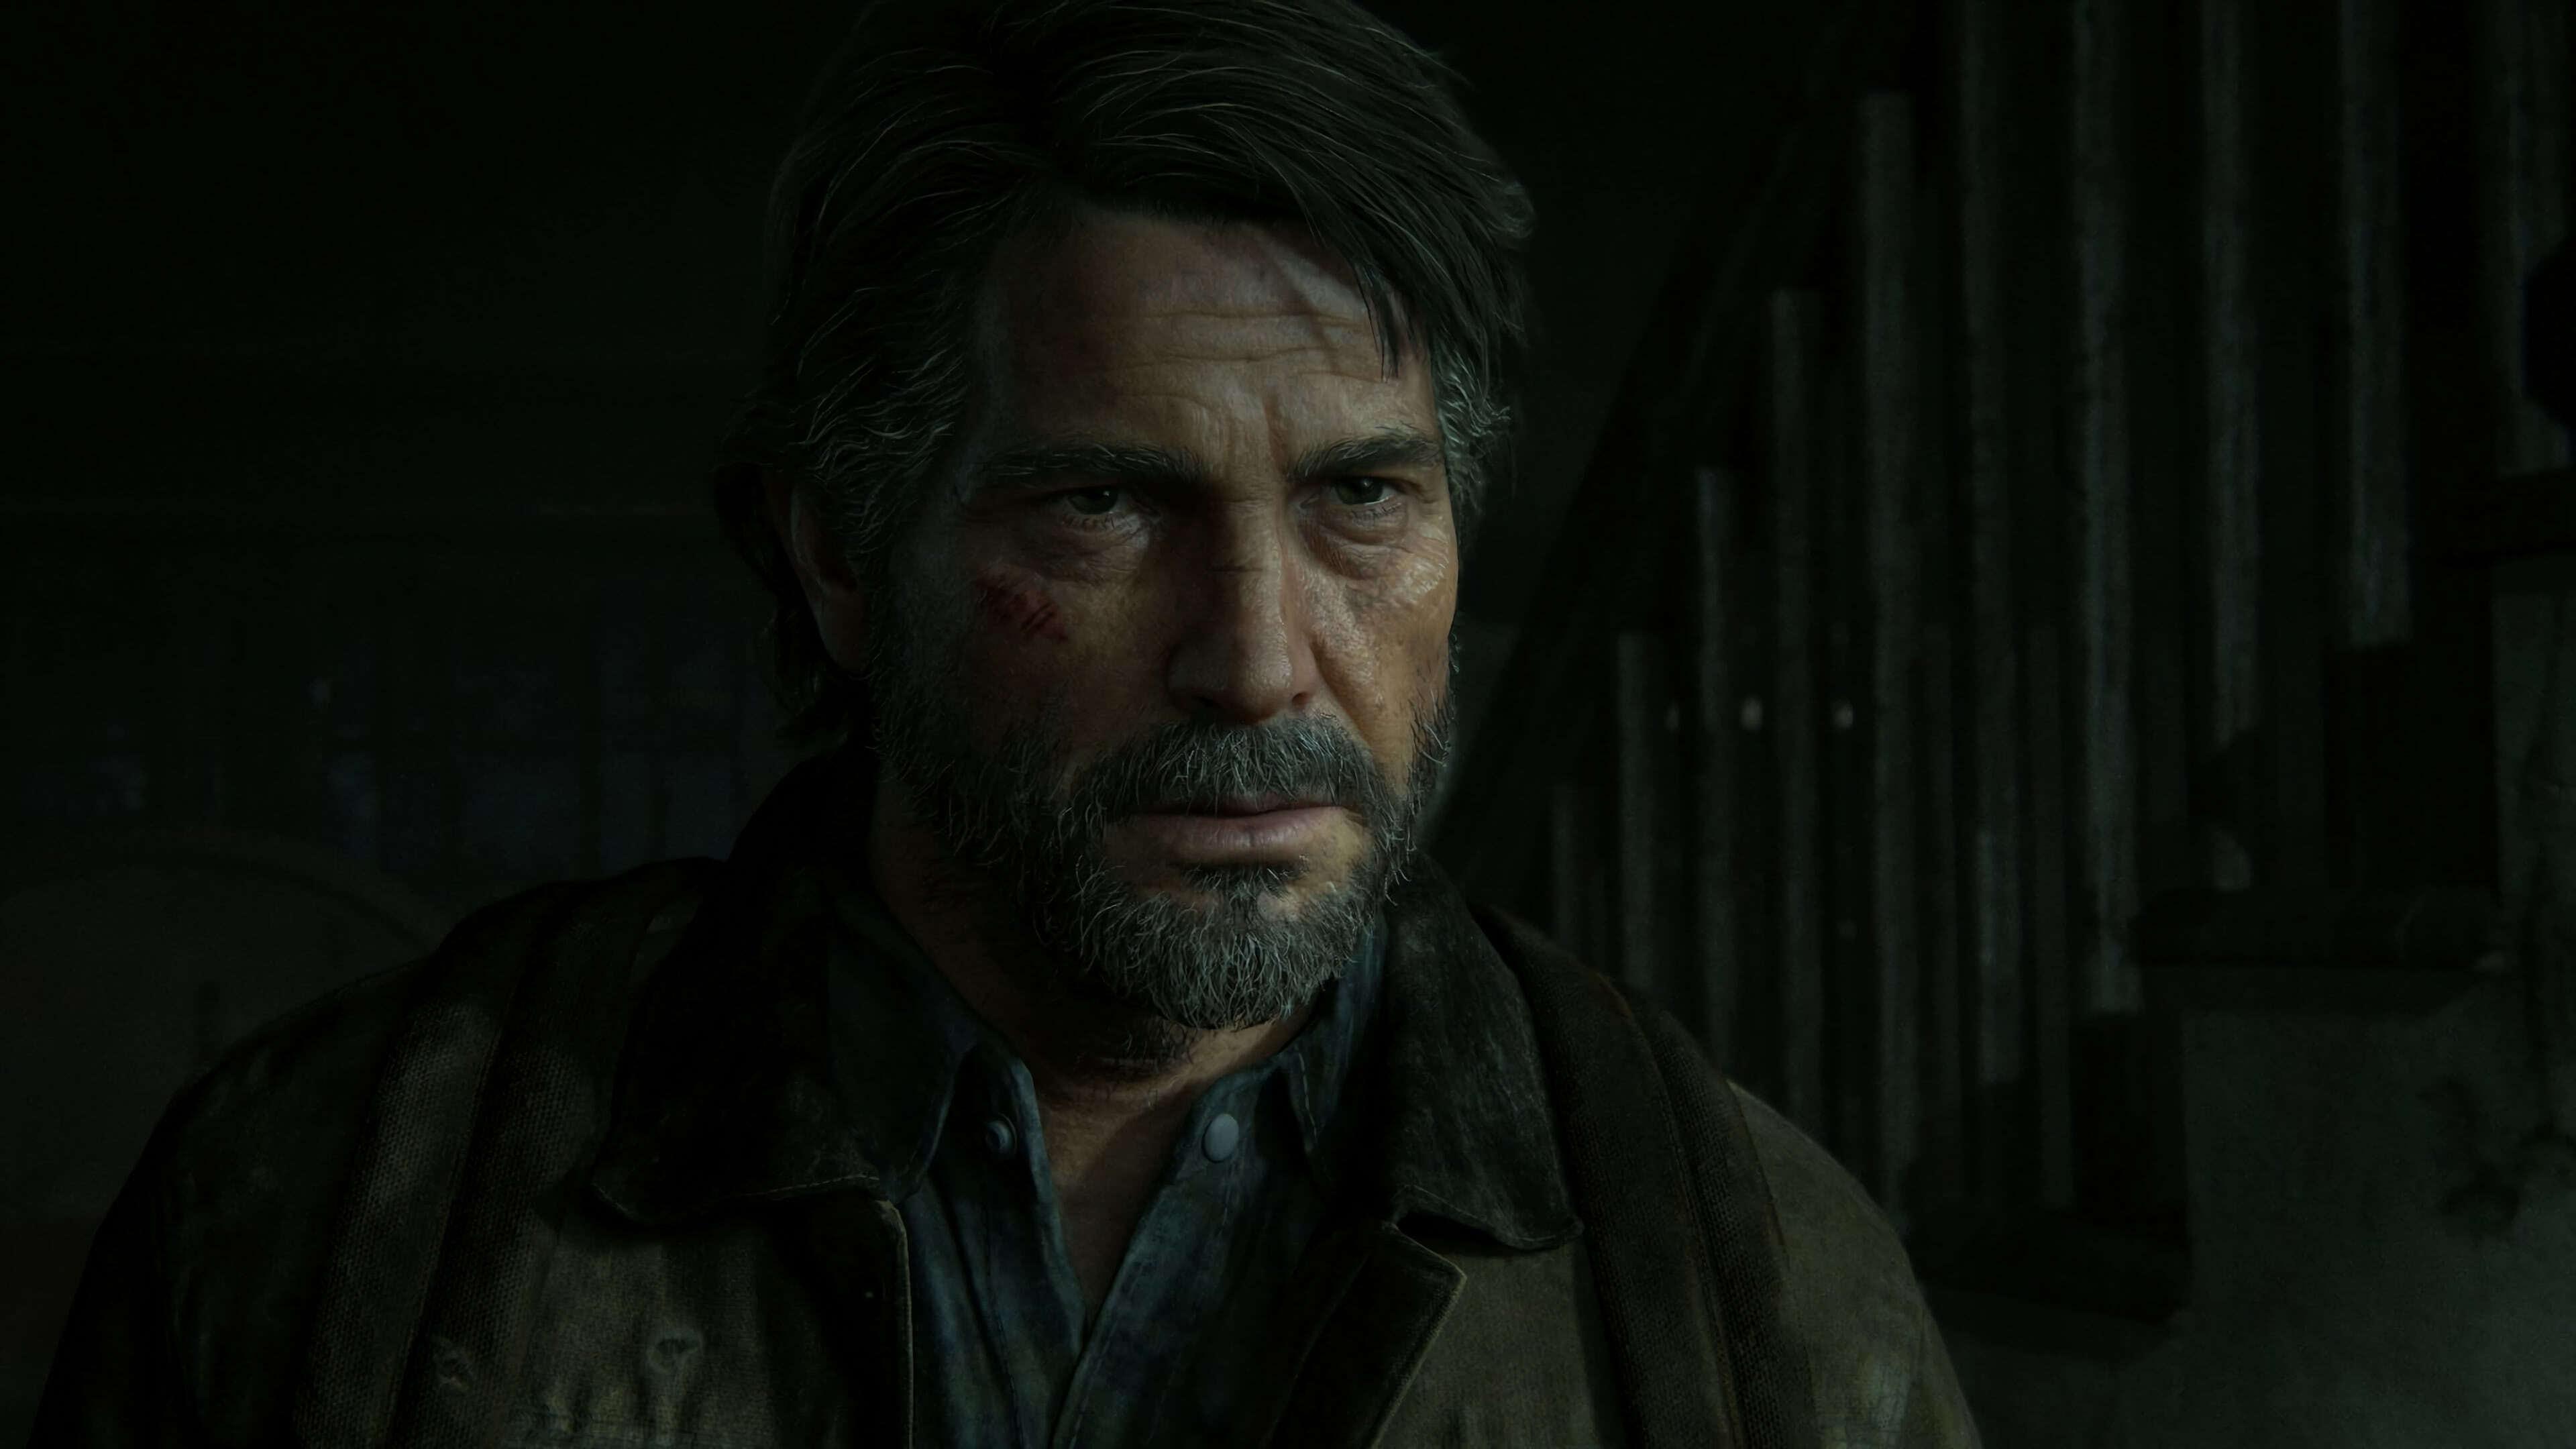 The Last Of Us Part 2 Joel Uhd 4k Wallpaper Last Of Us 2 Wallpaper Latest 3840x2160 Download Hd Wallpaper Wallpapertip